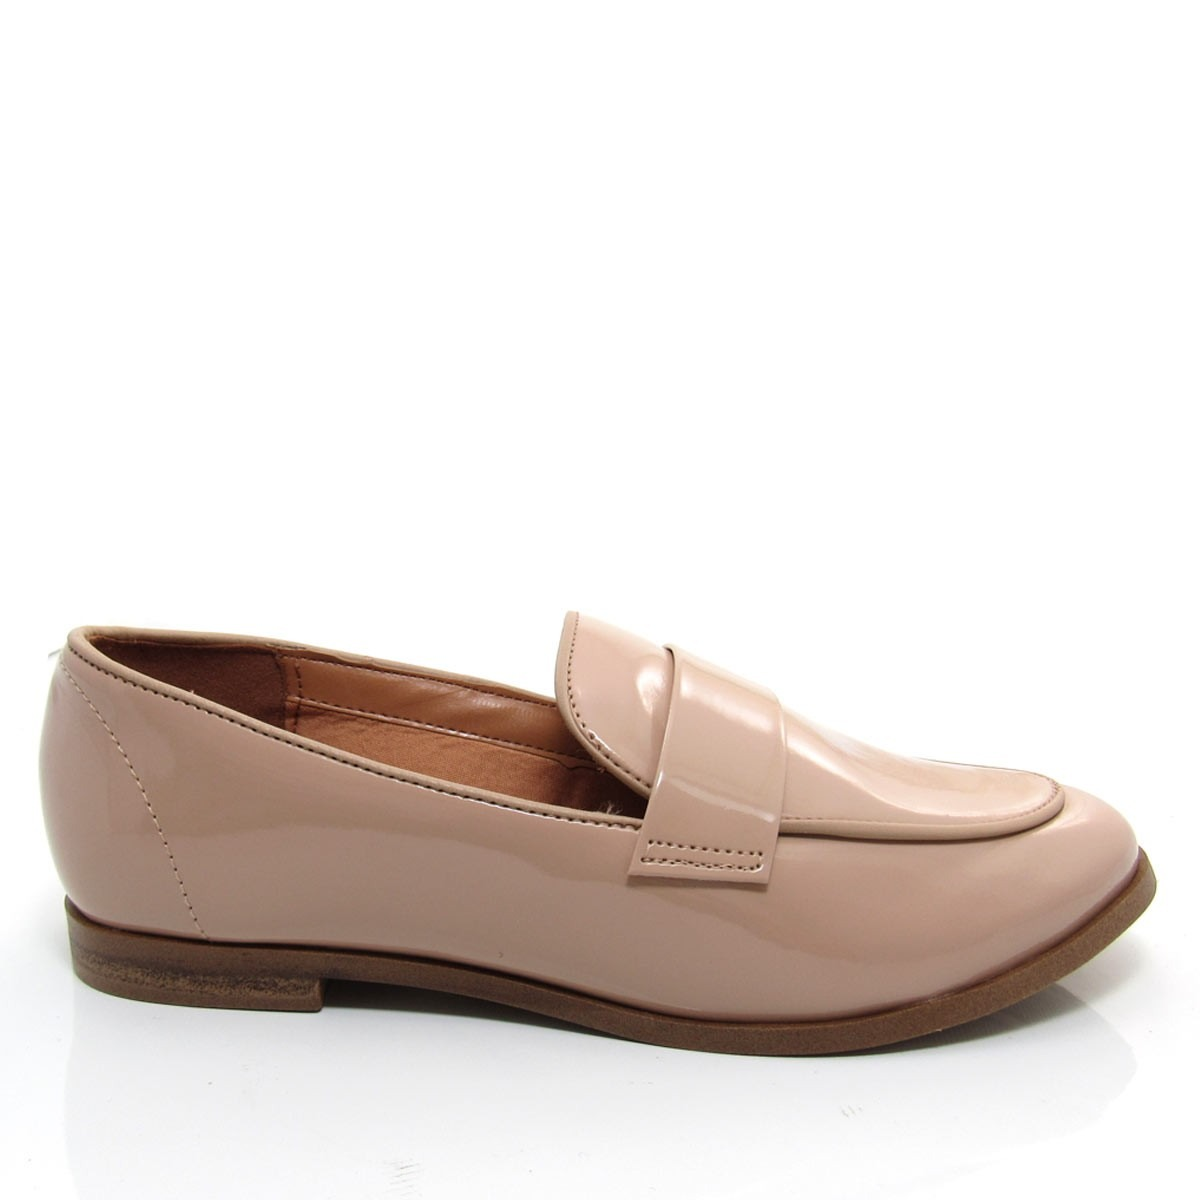 b5d6de4917 sapato feminino mocassim vizzano verniz 1248102 bege. Carregando zoom.